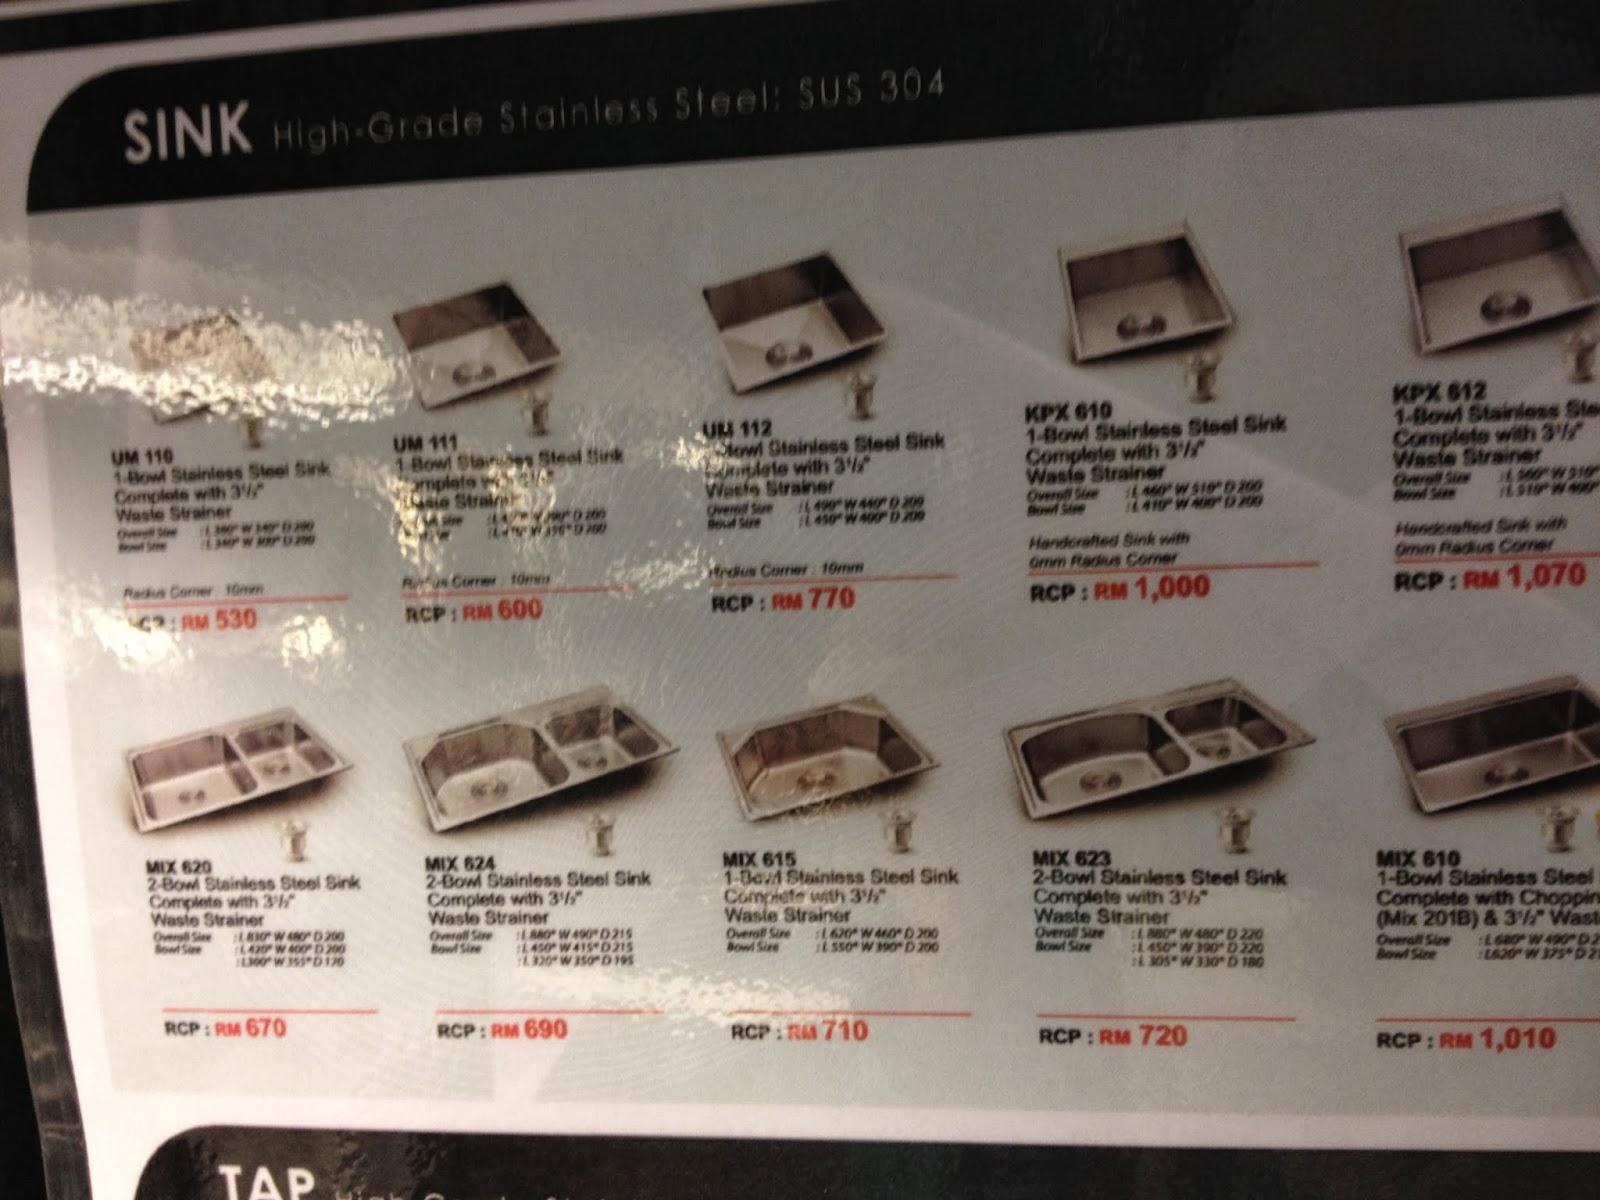 Pastu Kami Beli Tap Dapur Haustern Yang Simple Je Harga Sebenar Rm 580 Tapi Dia Offer Kat Kedai Ni Ialah 350 I E 40